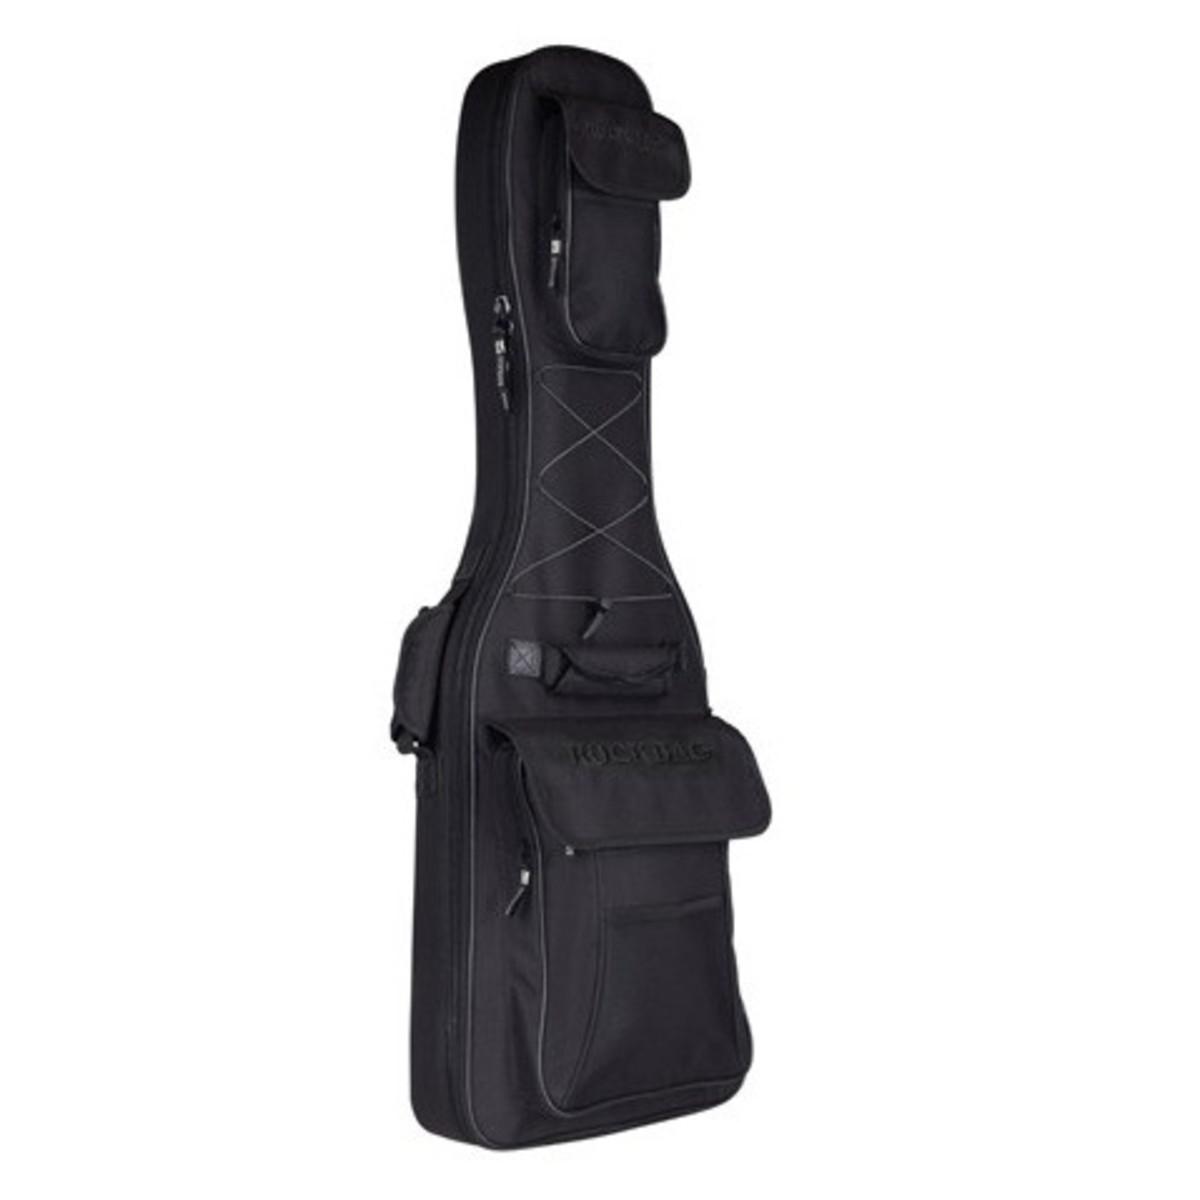 Rockbag Leather Bag Classical Guitar uWK3x8szR